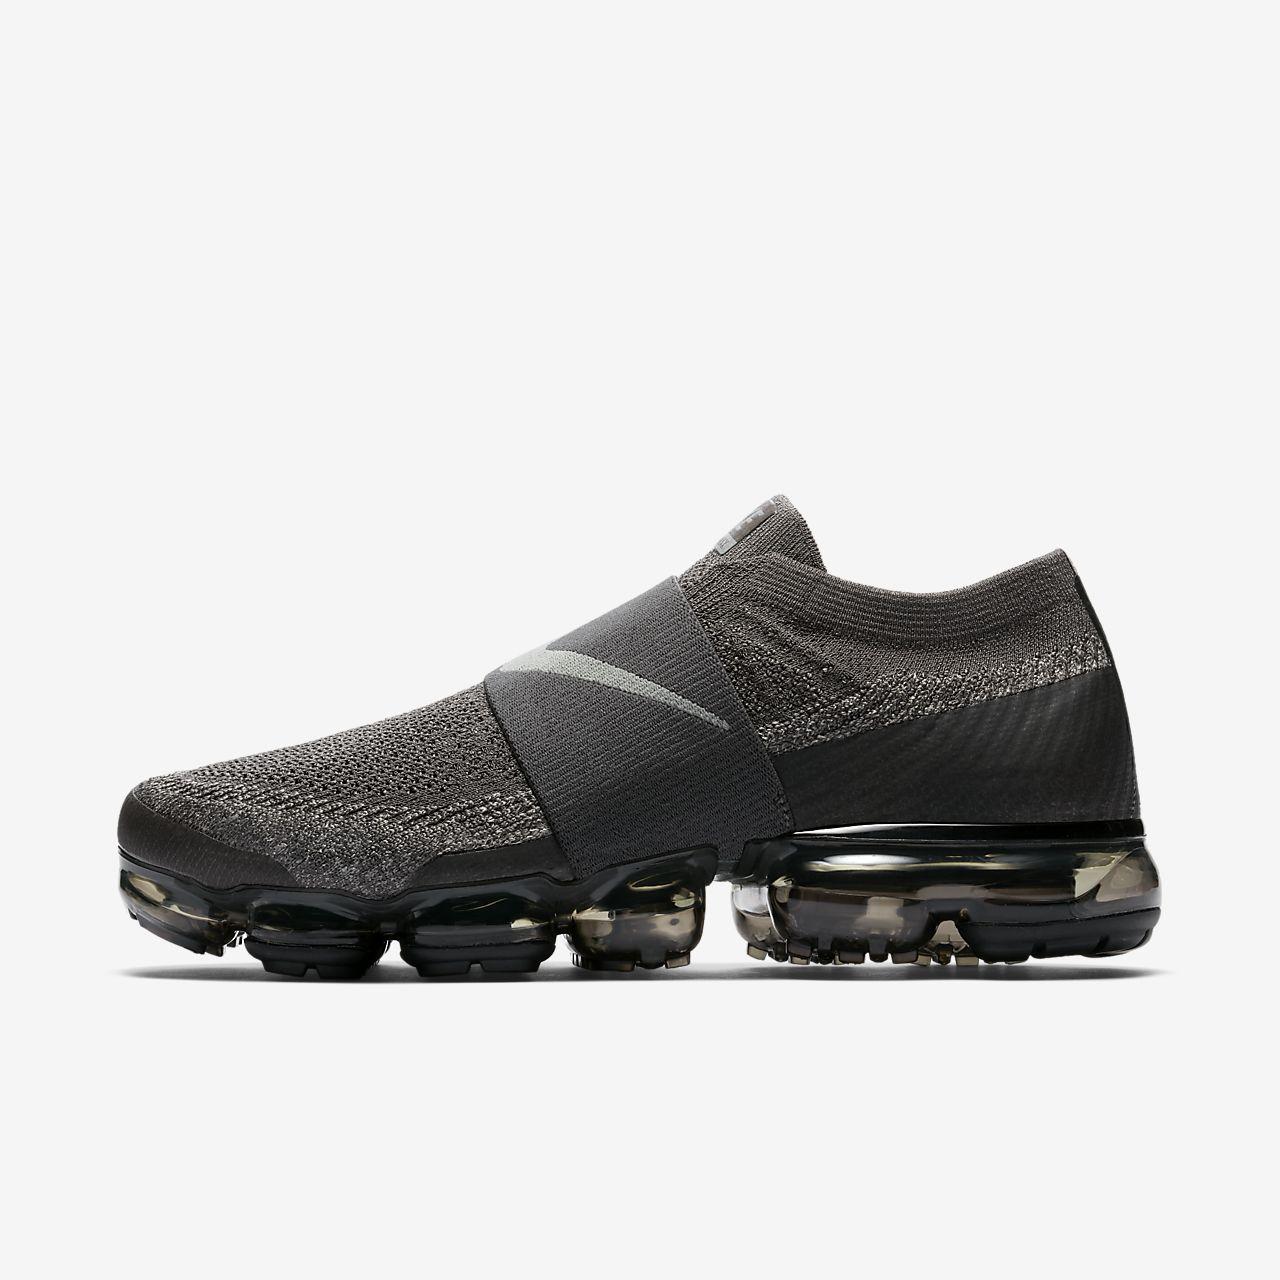 ... Chaussure de running Nike Air VaporMax Flyknit Moc pour Homme